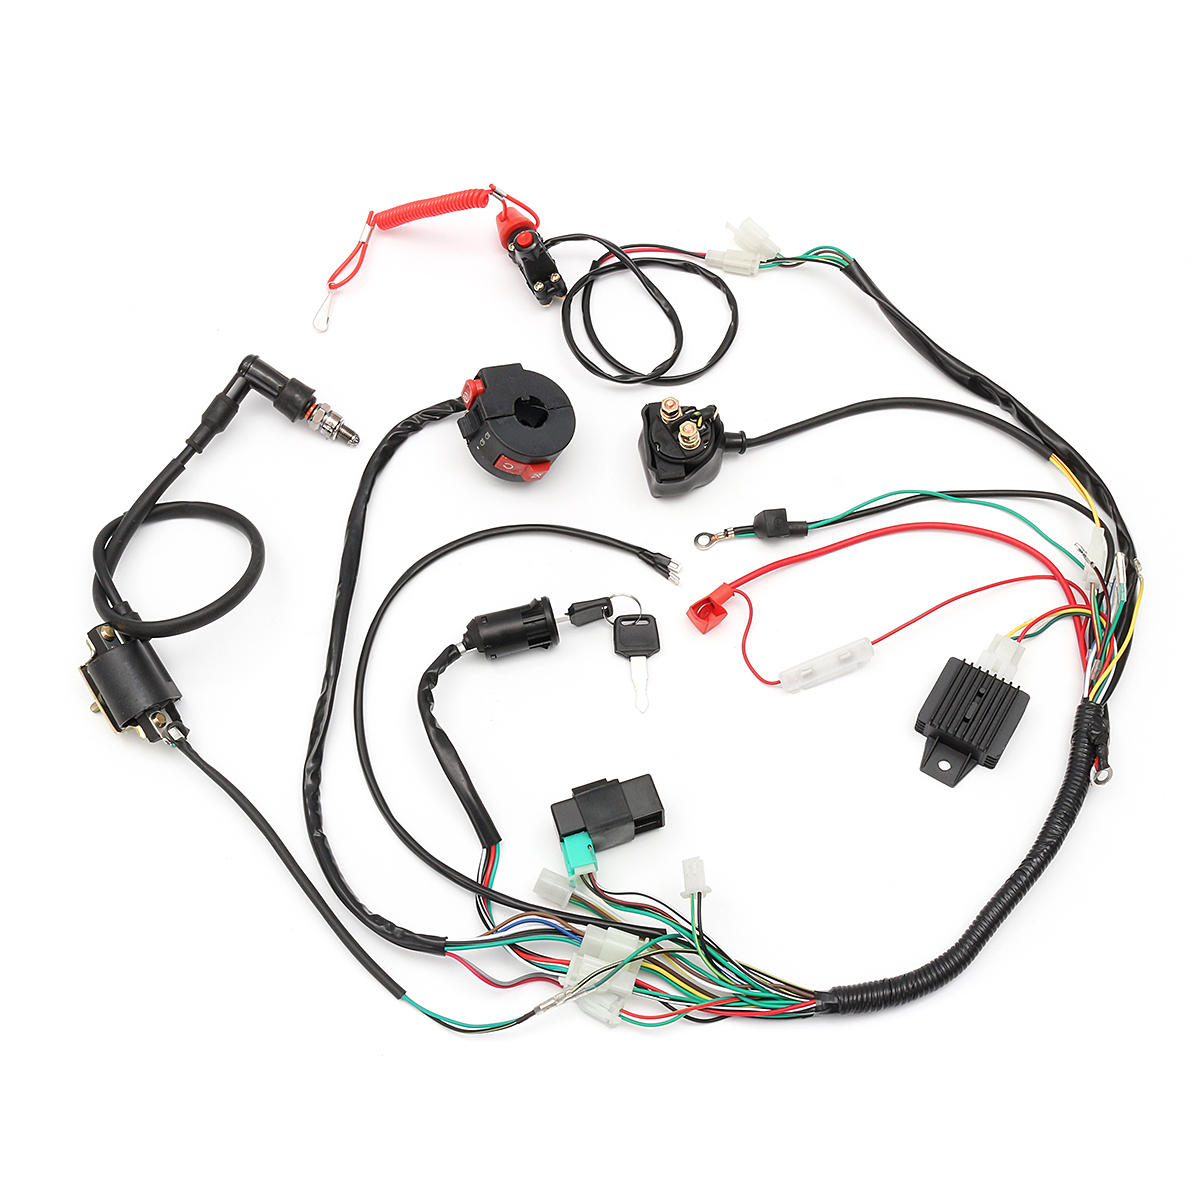 hight resolution of wiring harness loom solenoid coil rectifier cdi 50cc 70cc 110cc 125cc atv quad bike go kart